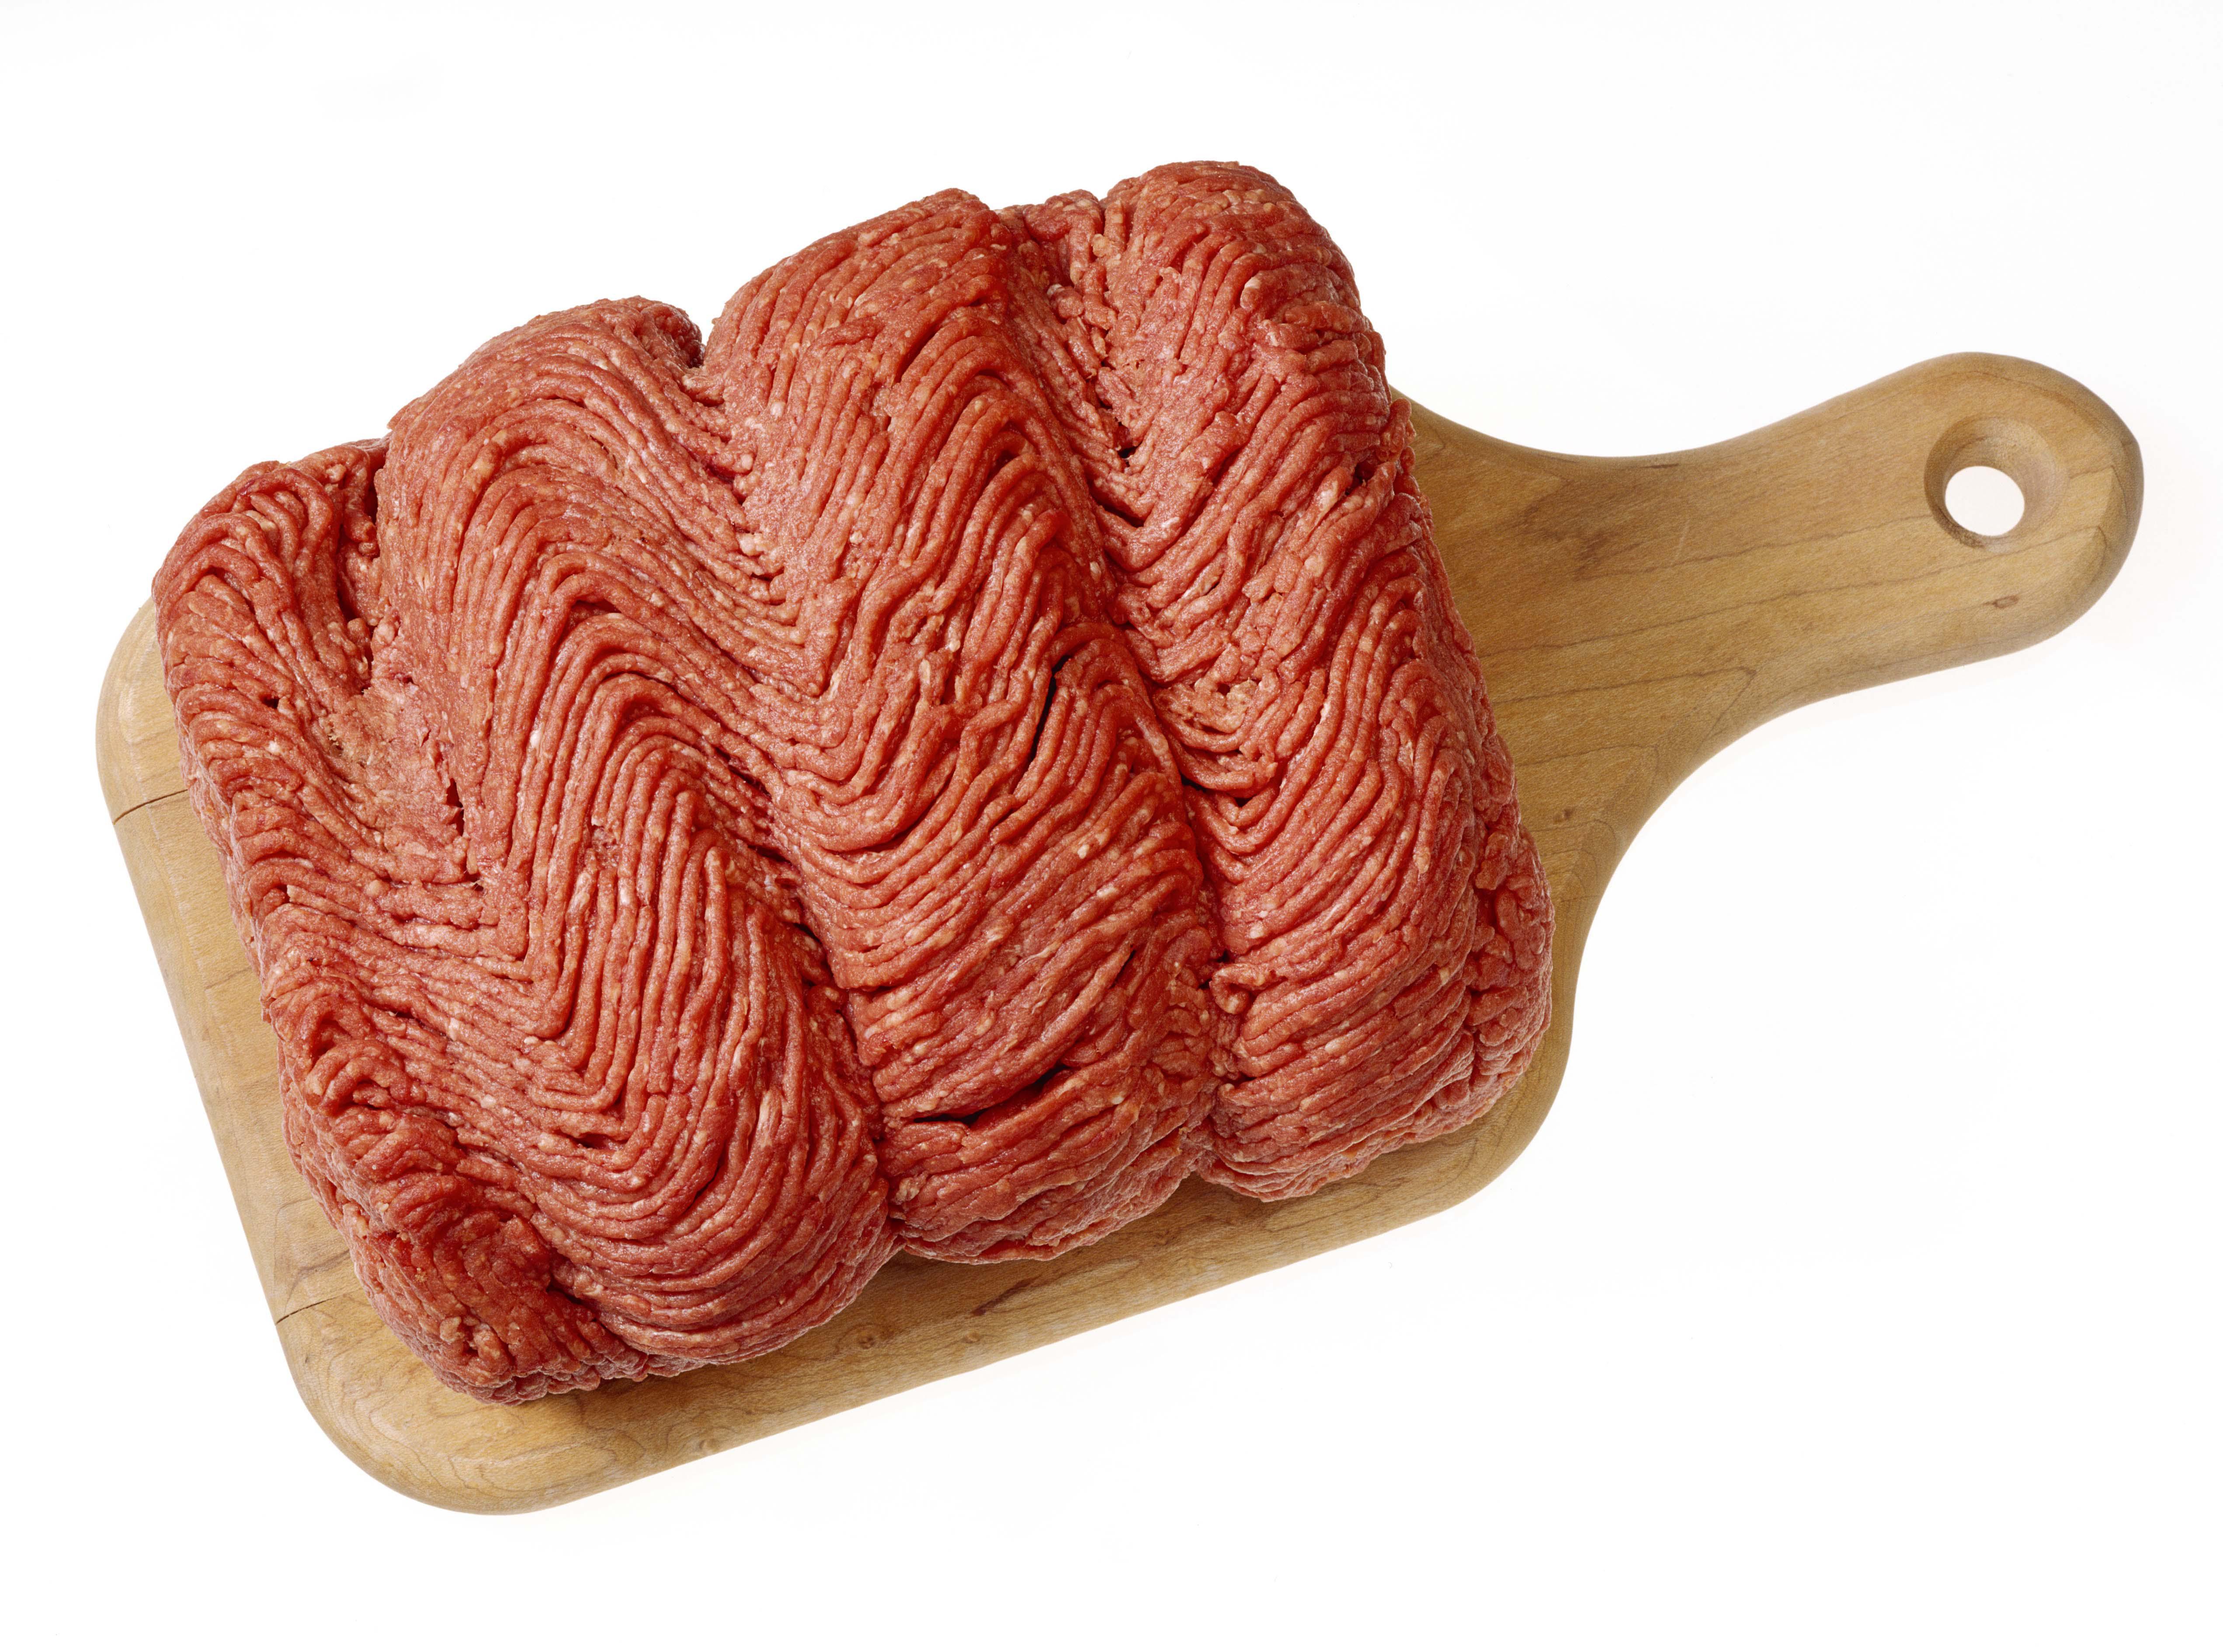 Raw ground beef on cutting board